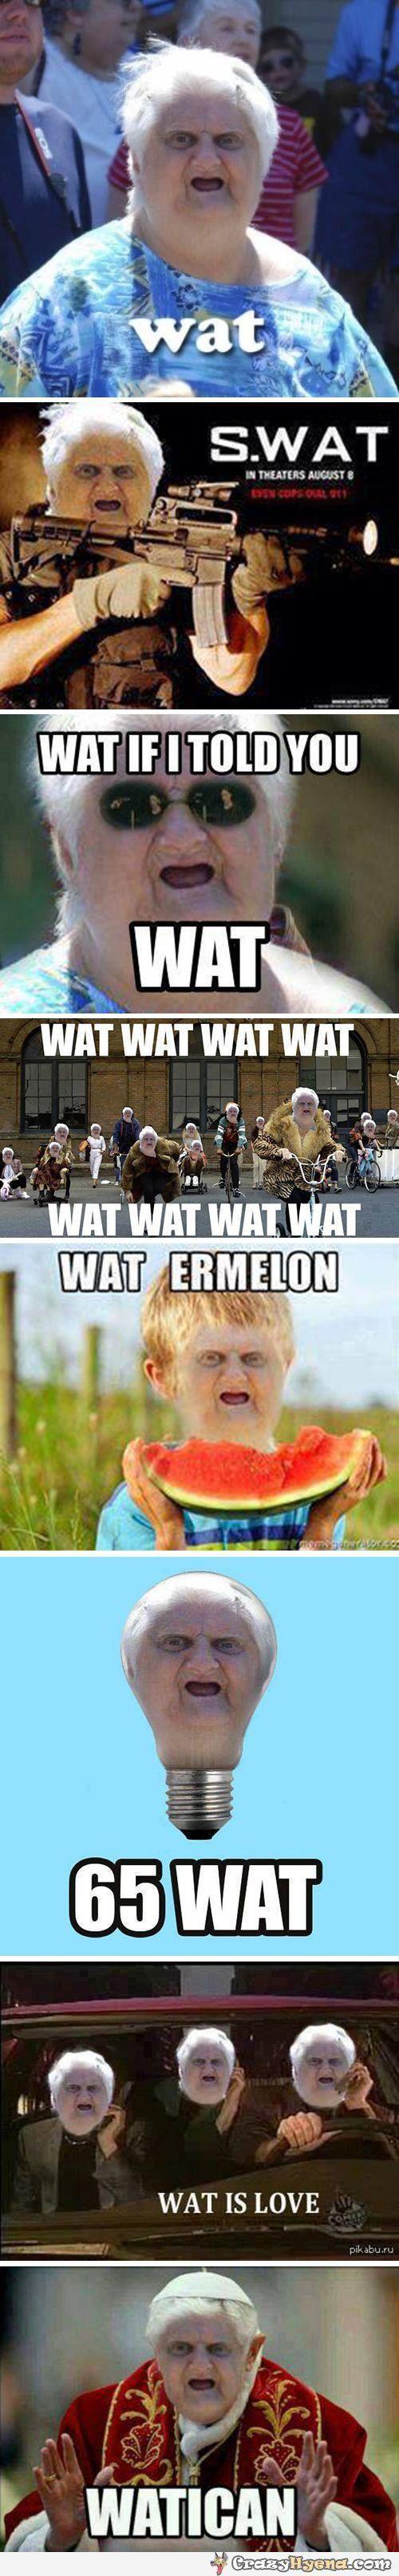 wat-old-lady-meme-compilation: